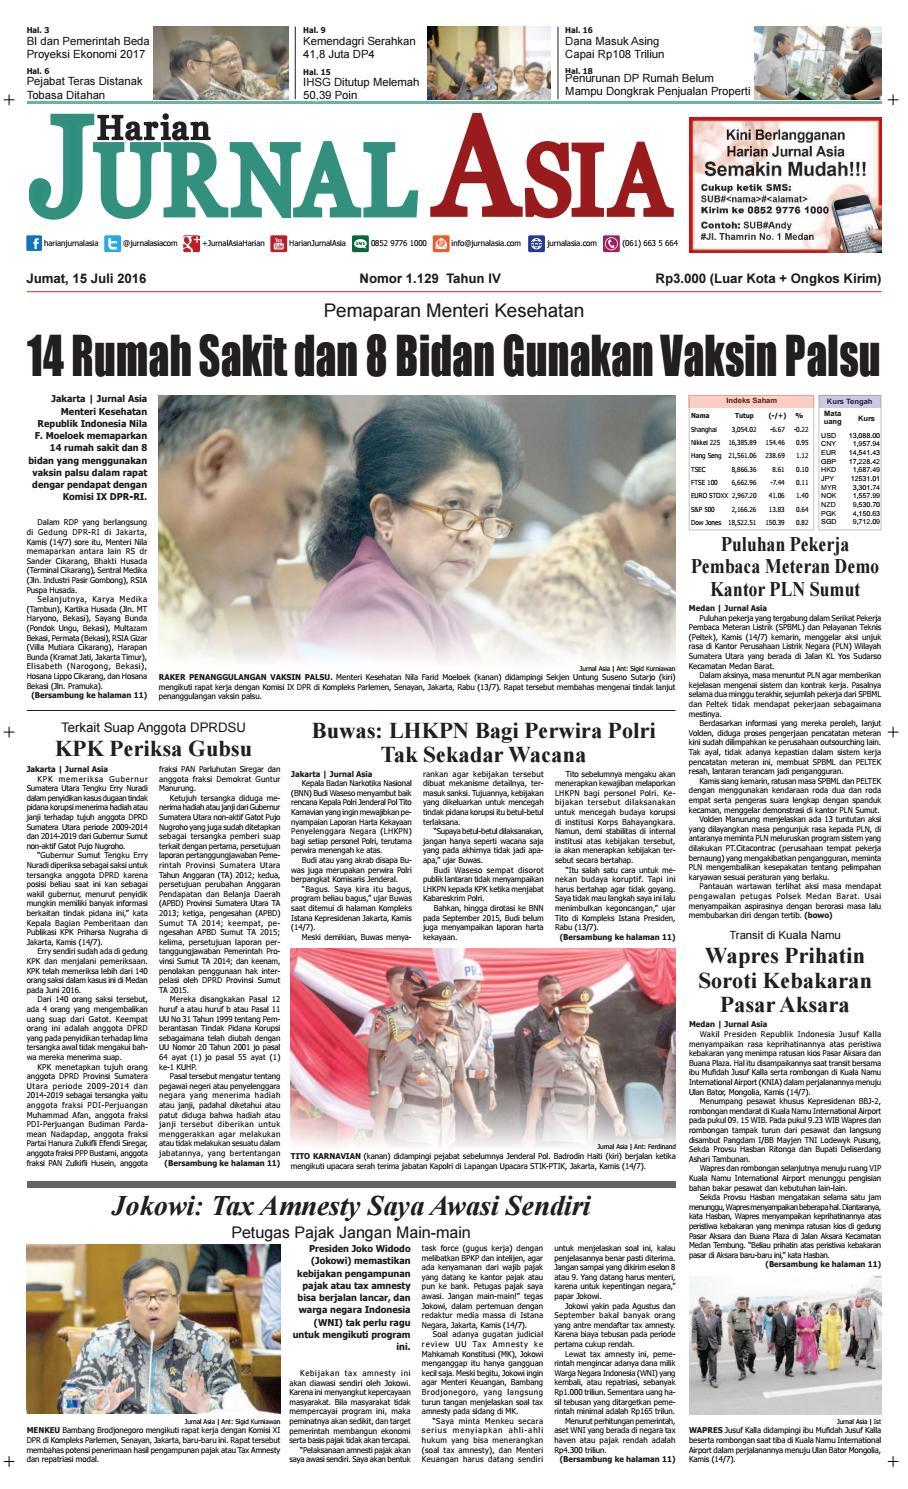 Harian Jurnal Asia Edisi Jumat 15 Juli 2016 By 95cm Nomor Tekstur Rumah Kantor Kamar Kost Hotel Kuningan No 1 Medan Issuu